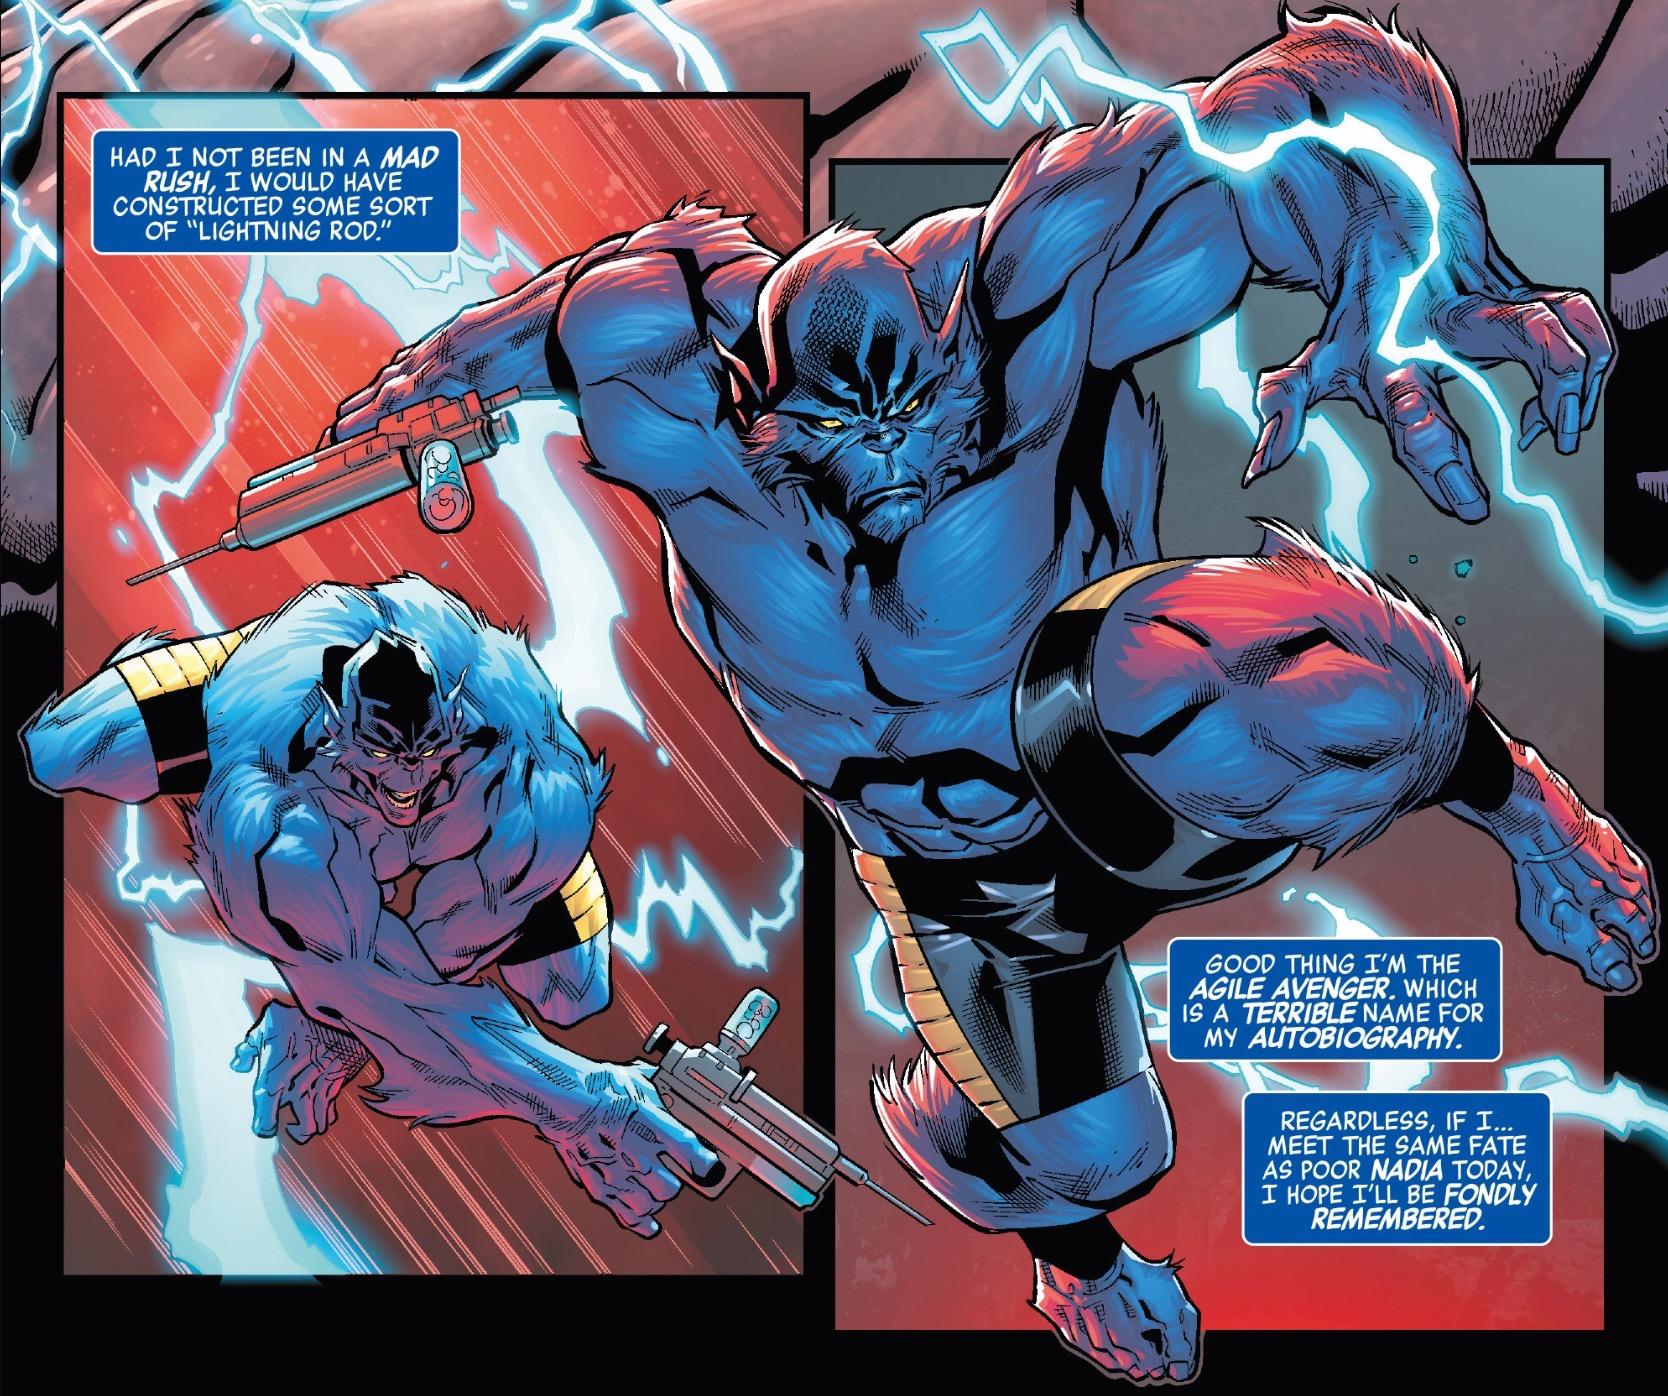 Avengers  #683 by Mark Waid, Jim Zub, Al Ewing, Paco Medina, Juan Vlasco, and Jesus Aburtov